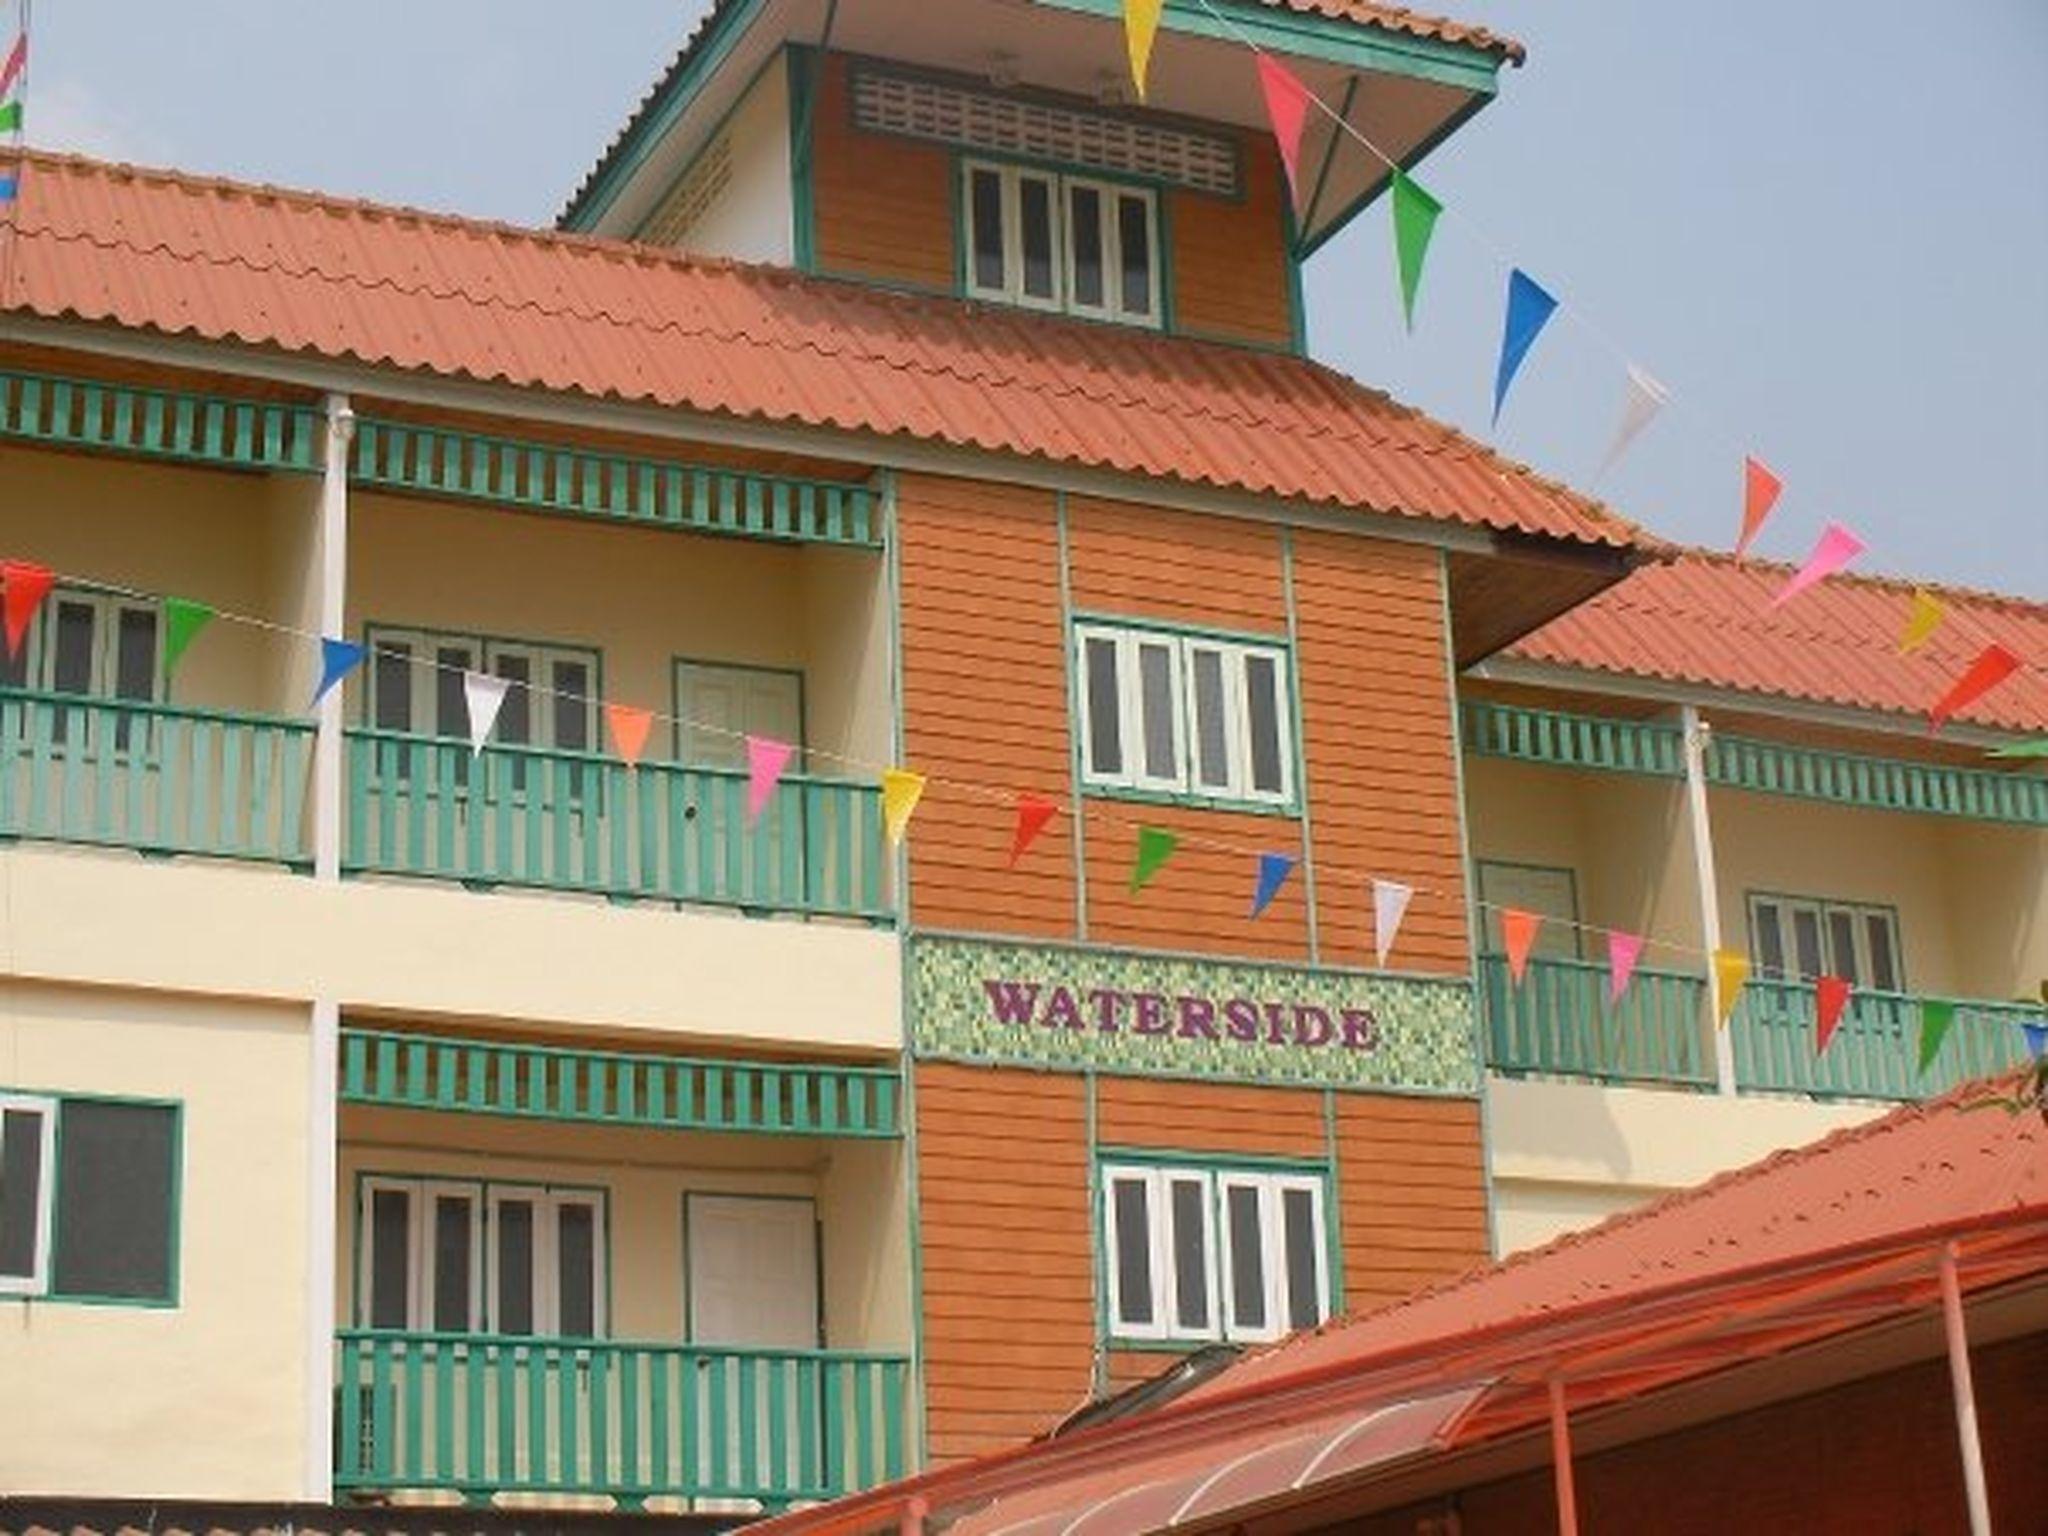 Waterside Boutique Hotel